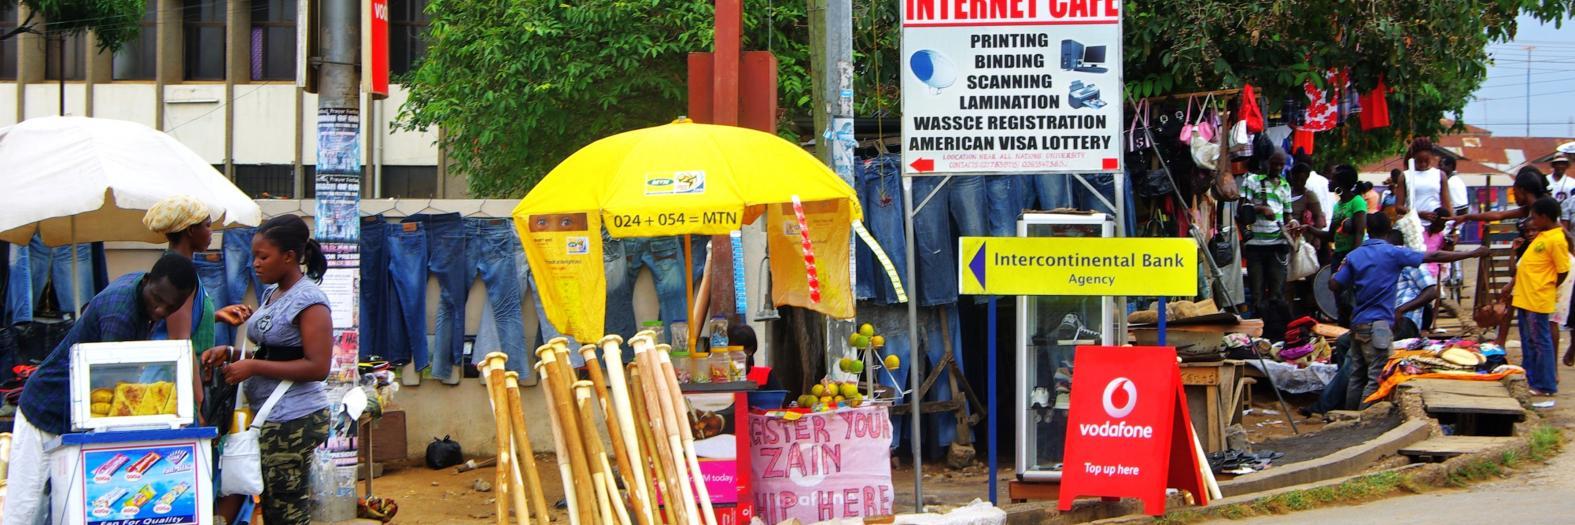 "An Internet café in urban Ghana <a href=""http://flic.kr/p/8uL3pC"">(photo: Alan Lew, 2010</a>)"